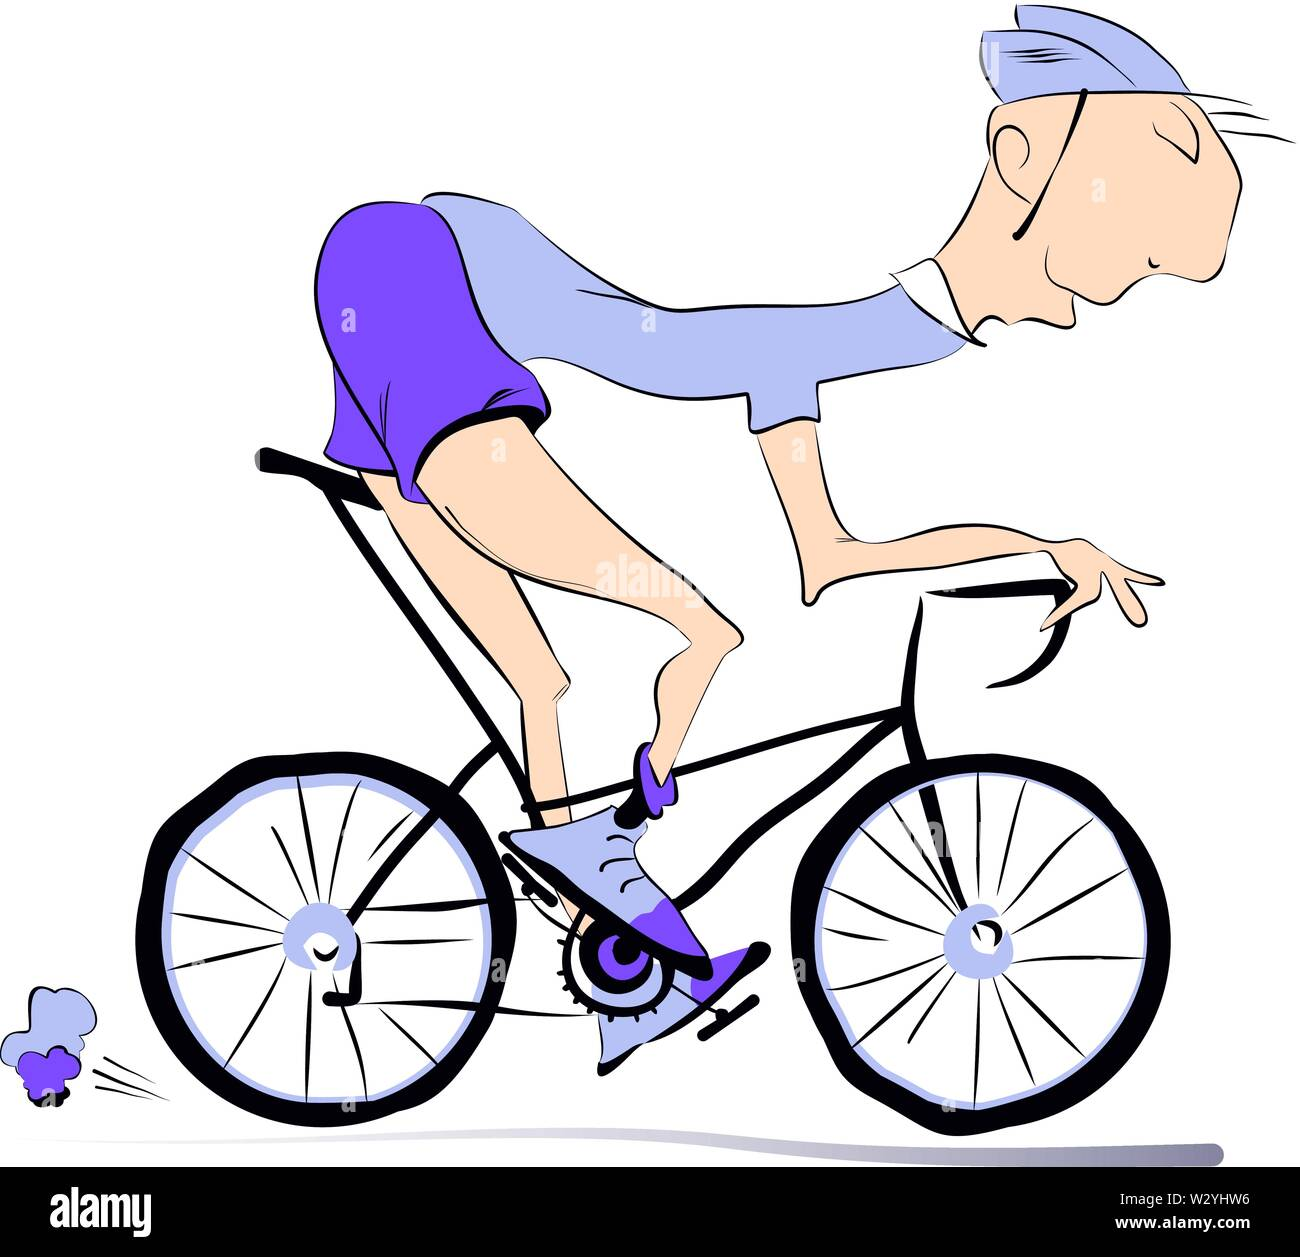 Lustige Cartoons Mit Farbe Fahrrad Fur Kinder Und Kinderlieder